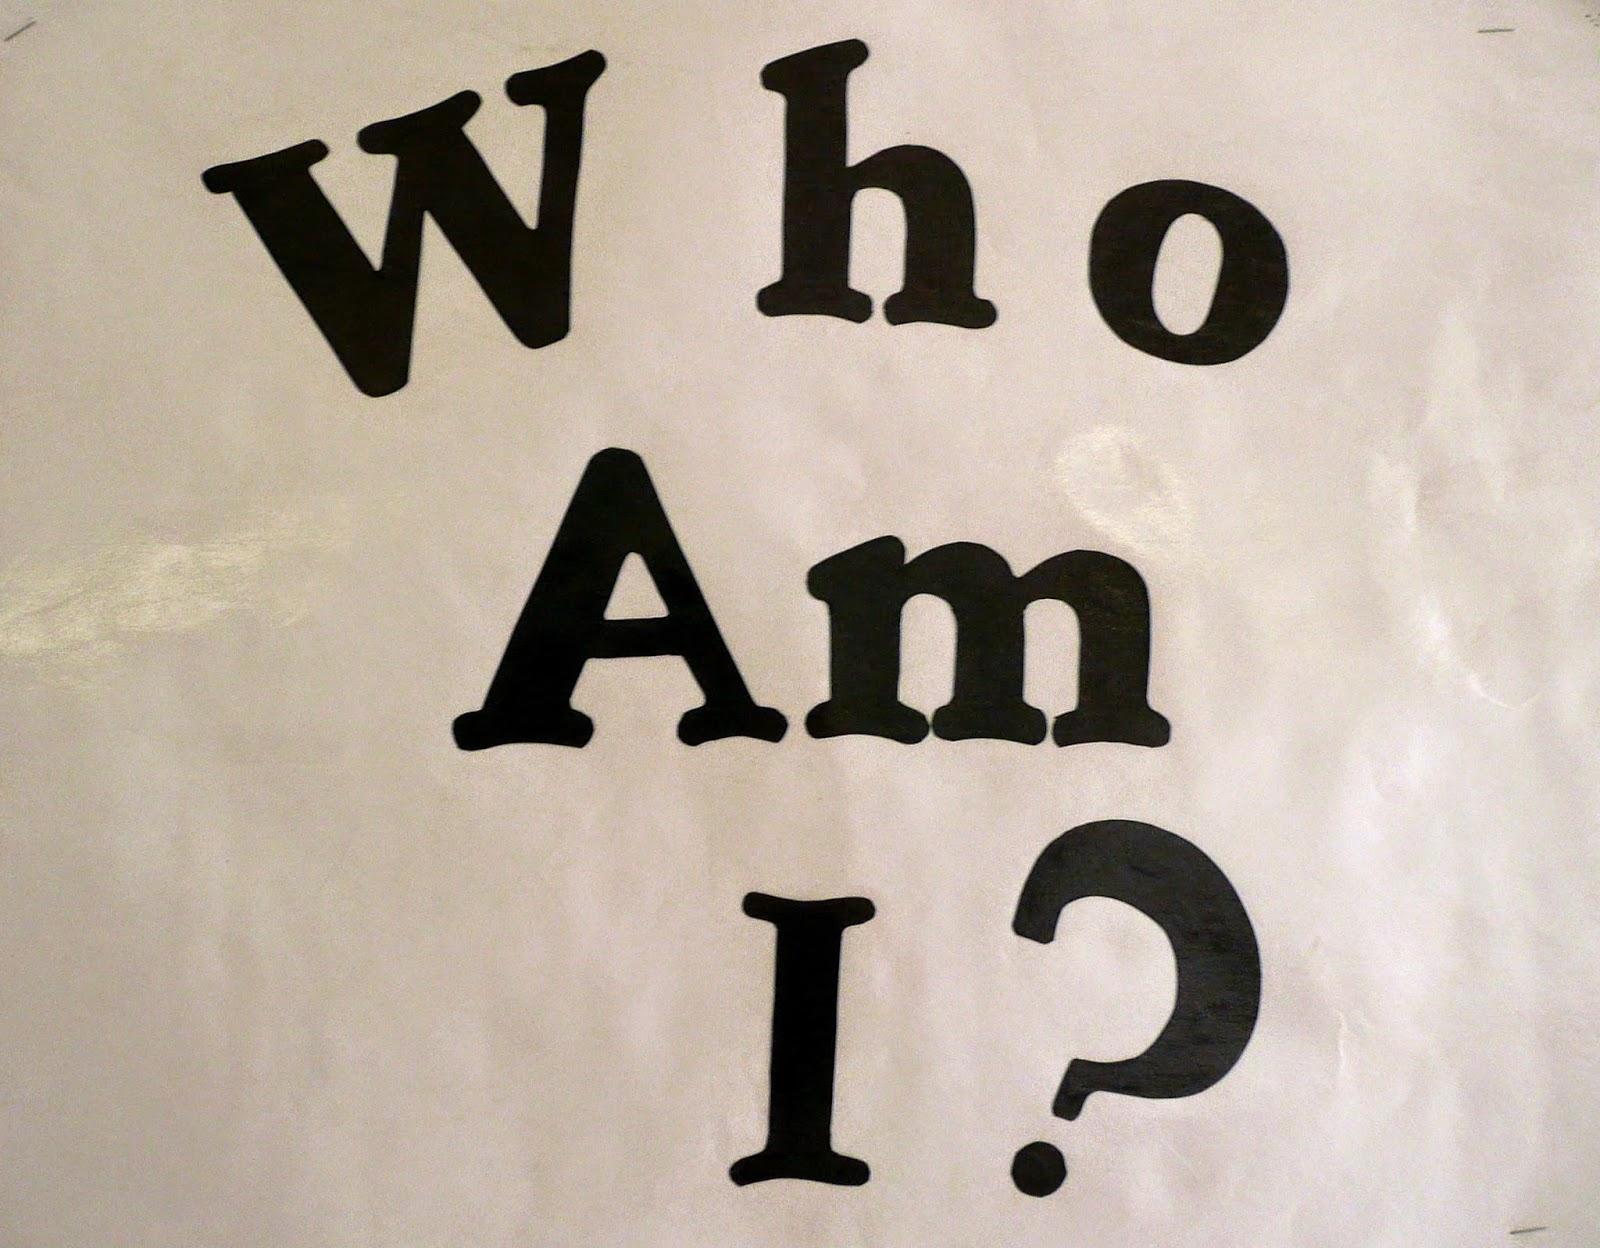 http://whoamidentity.blogspot.com.es/